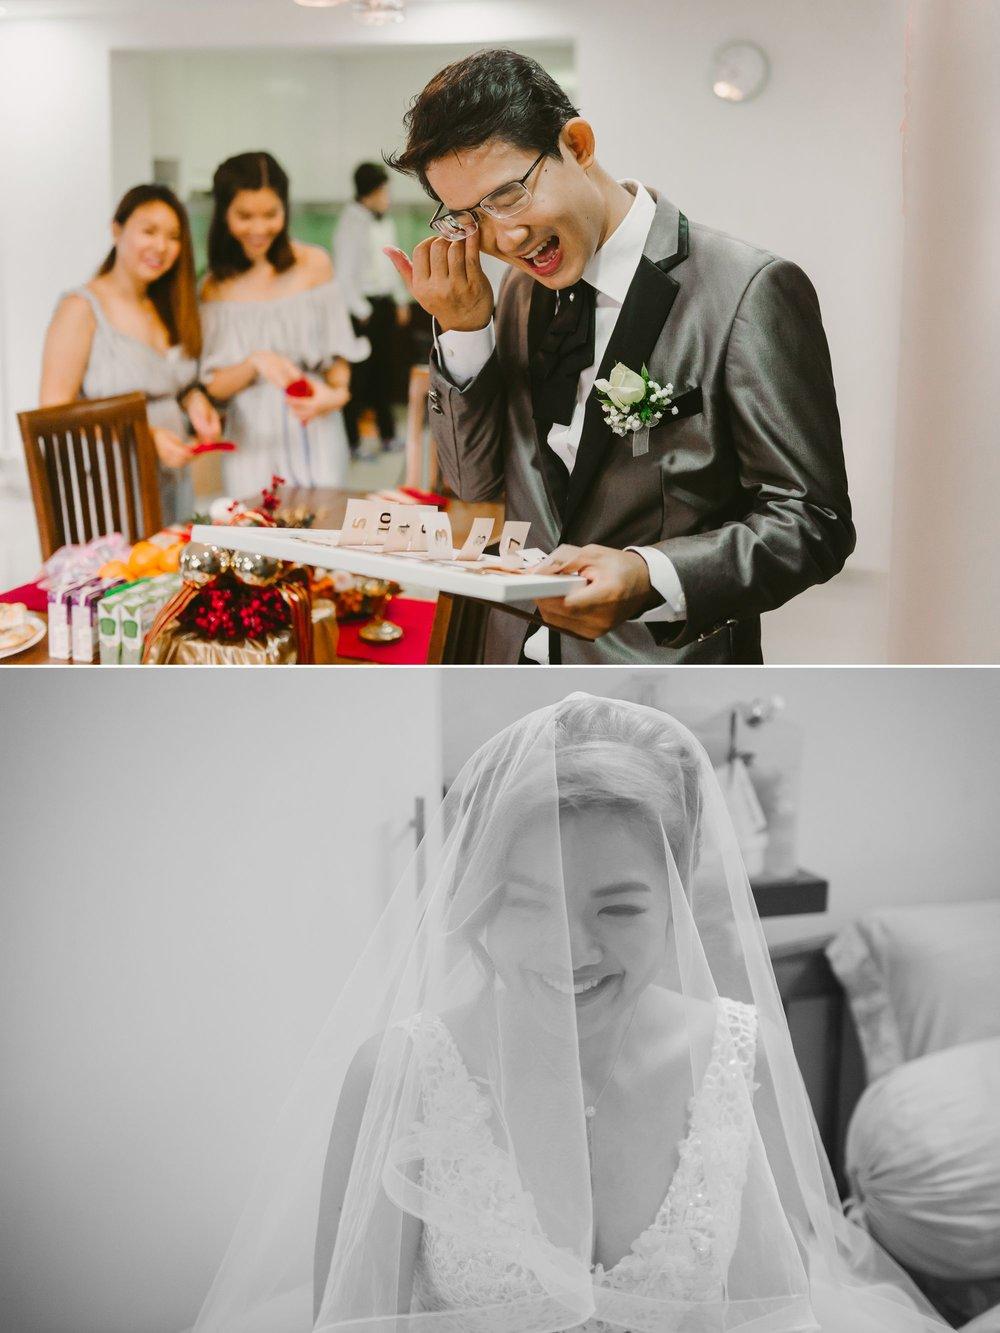 wedding_photographer_singapore 12.jpg